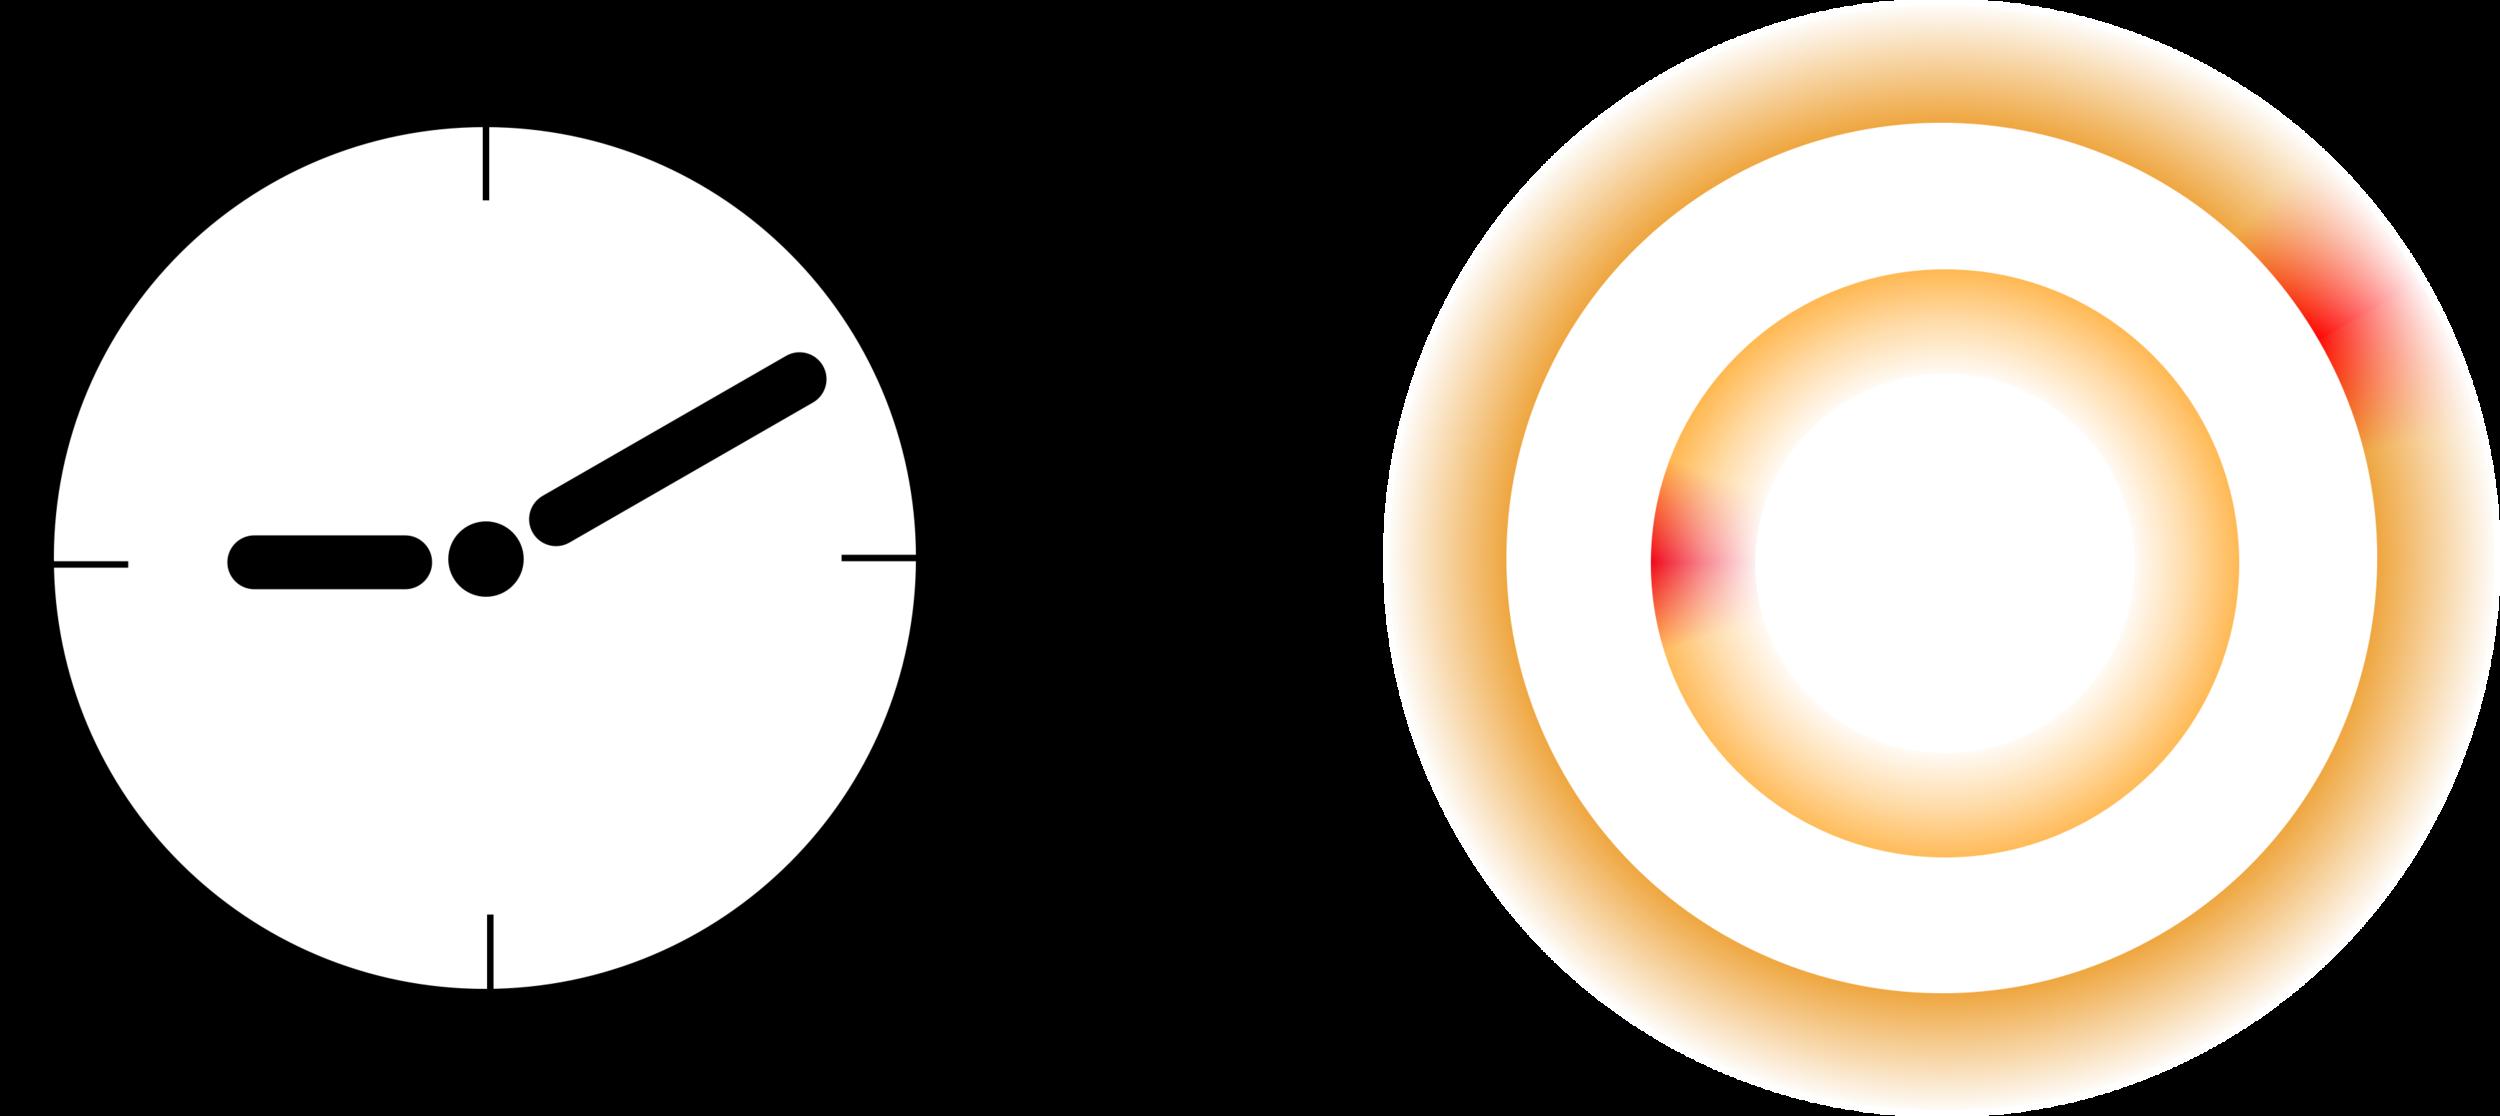 9:10 pm = 9:10 pm